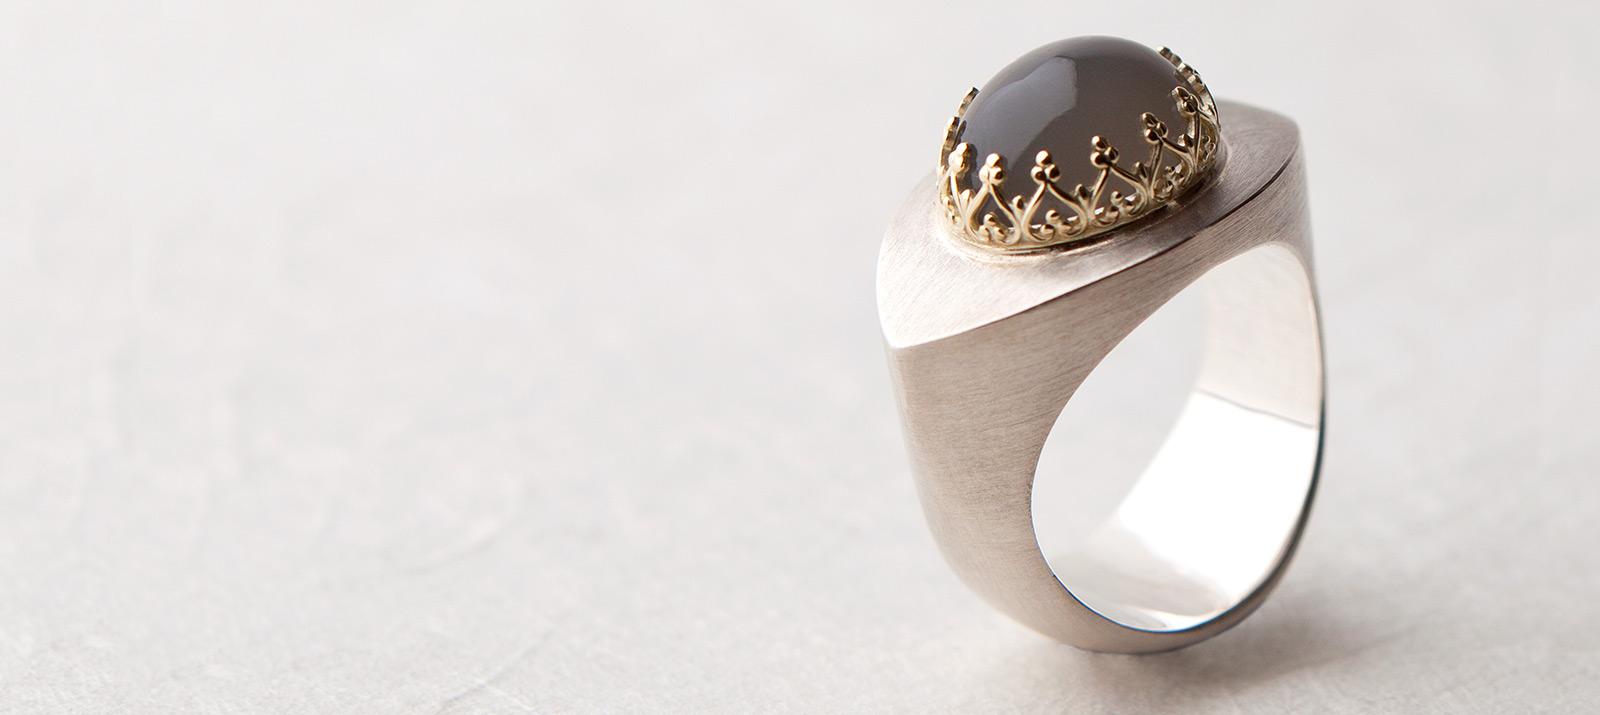 Mondstein Ring. 925 Silber, 750 Gold. Unikat.